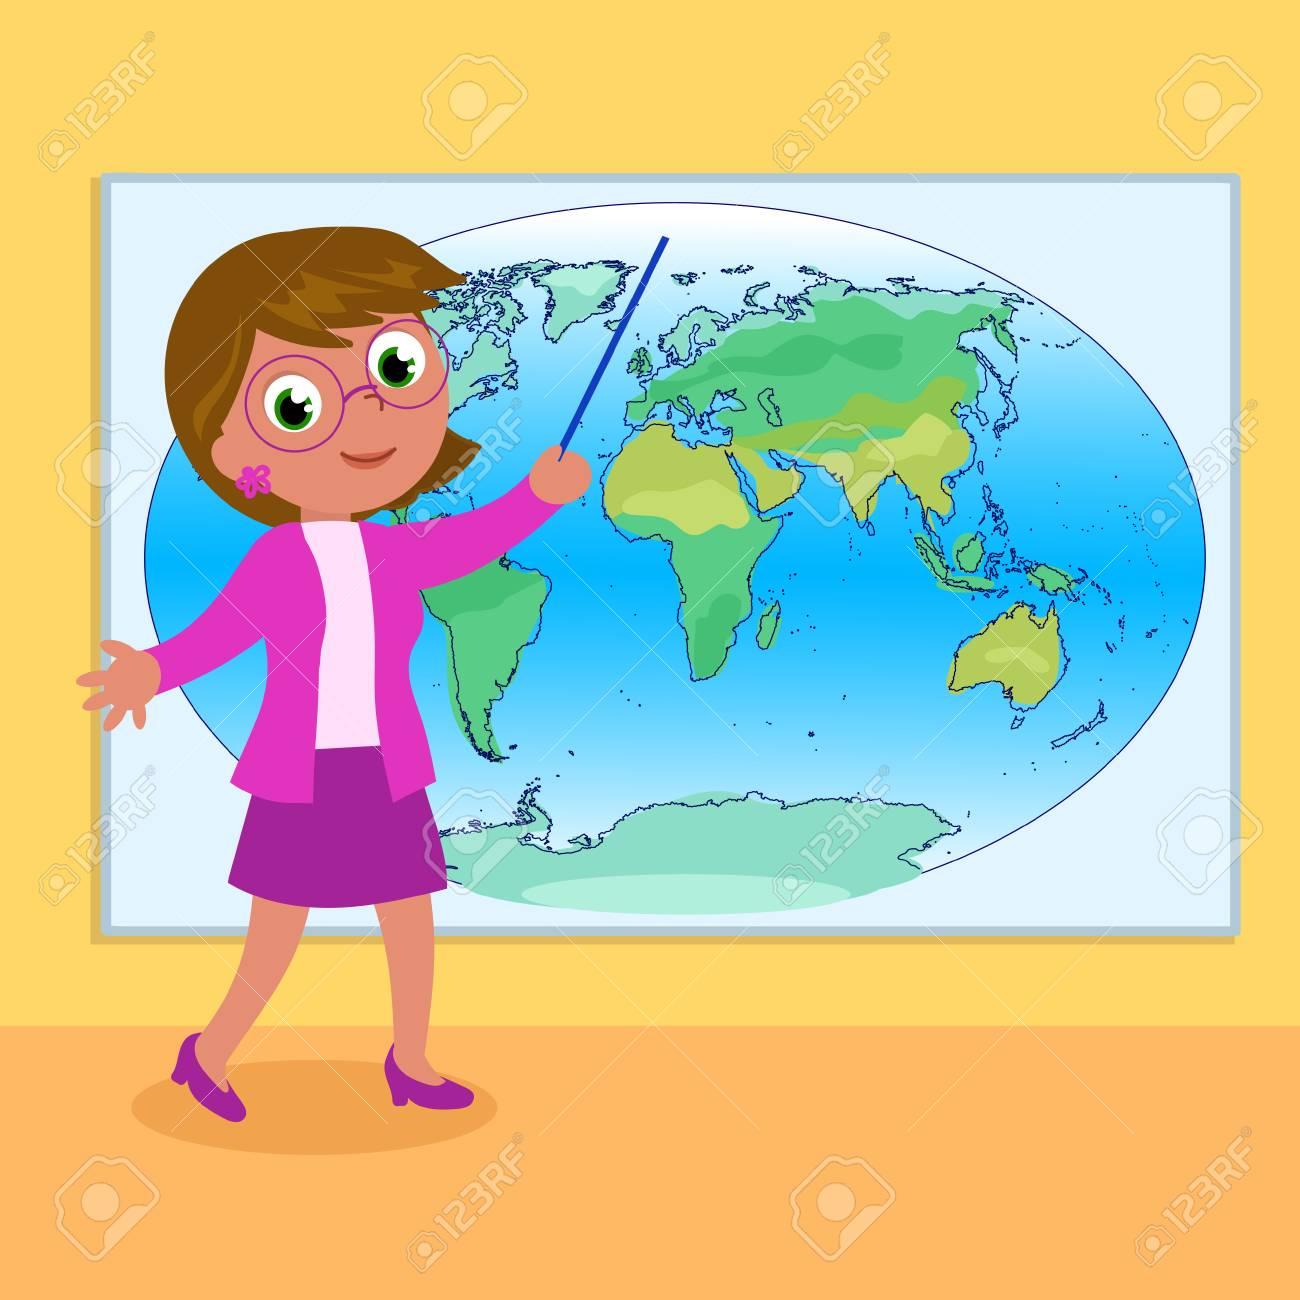 vector woman geography teacher with world map cartoon illustration